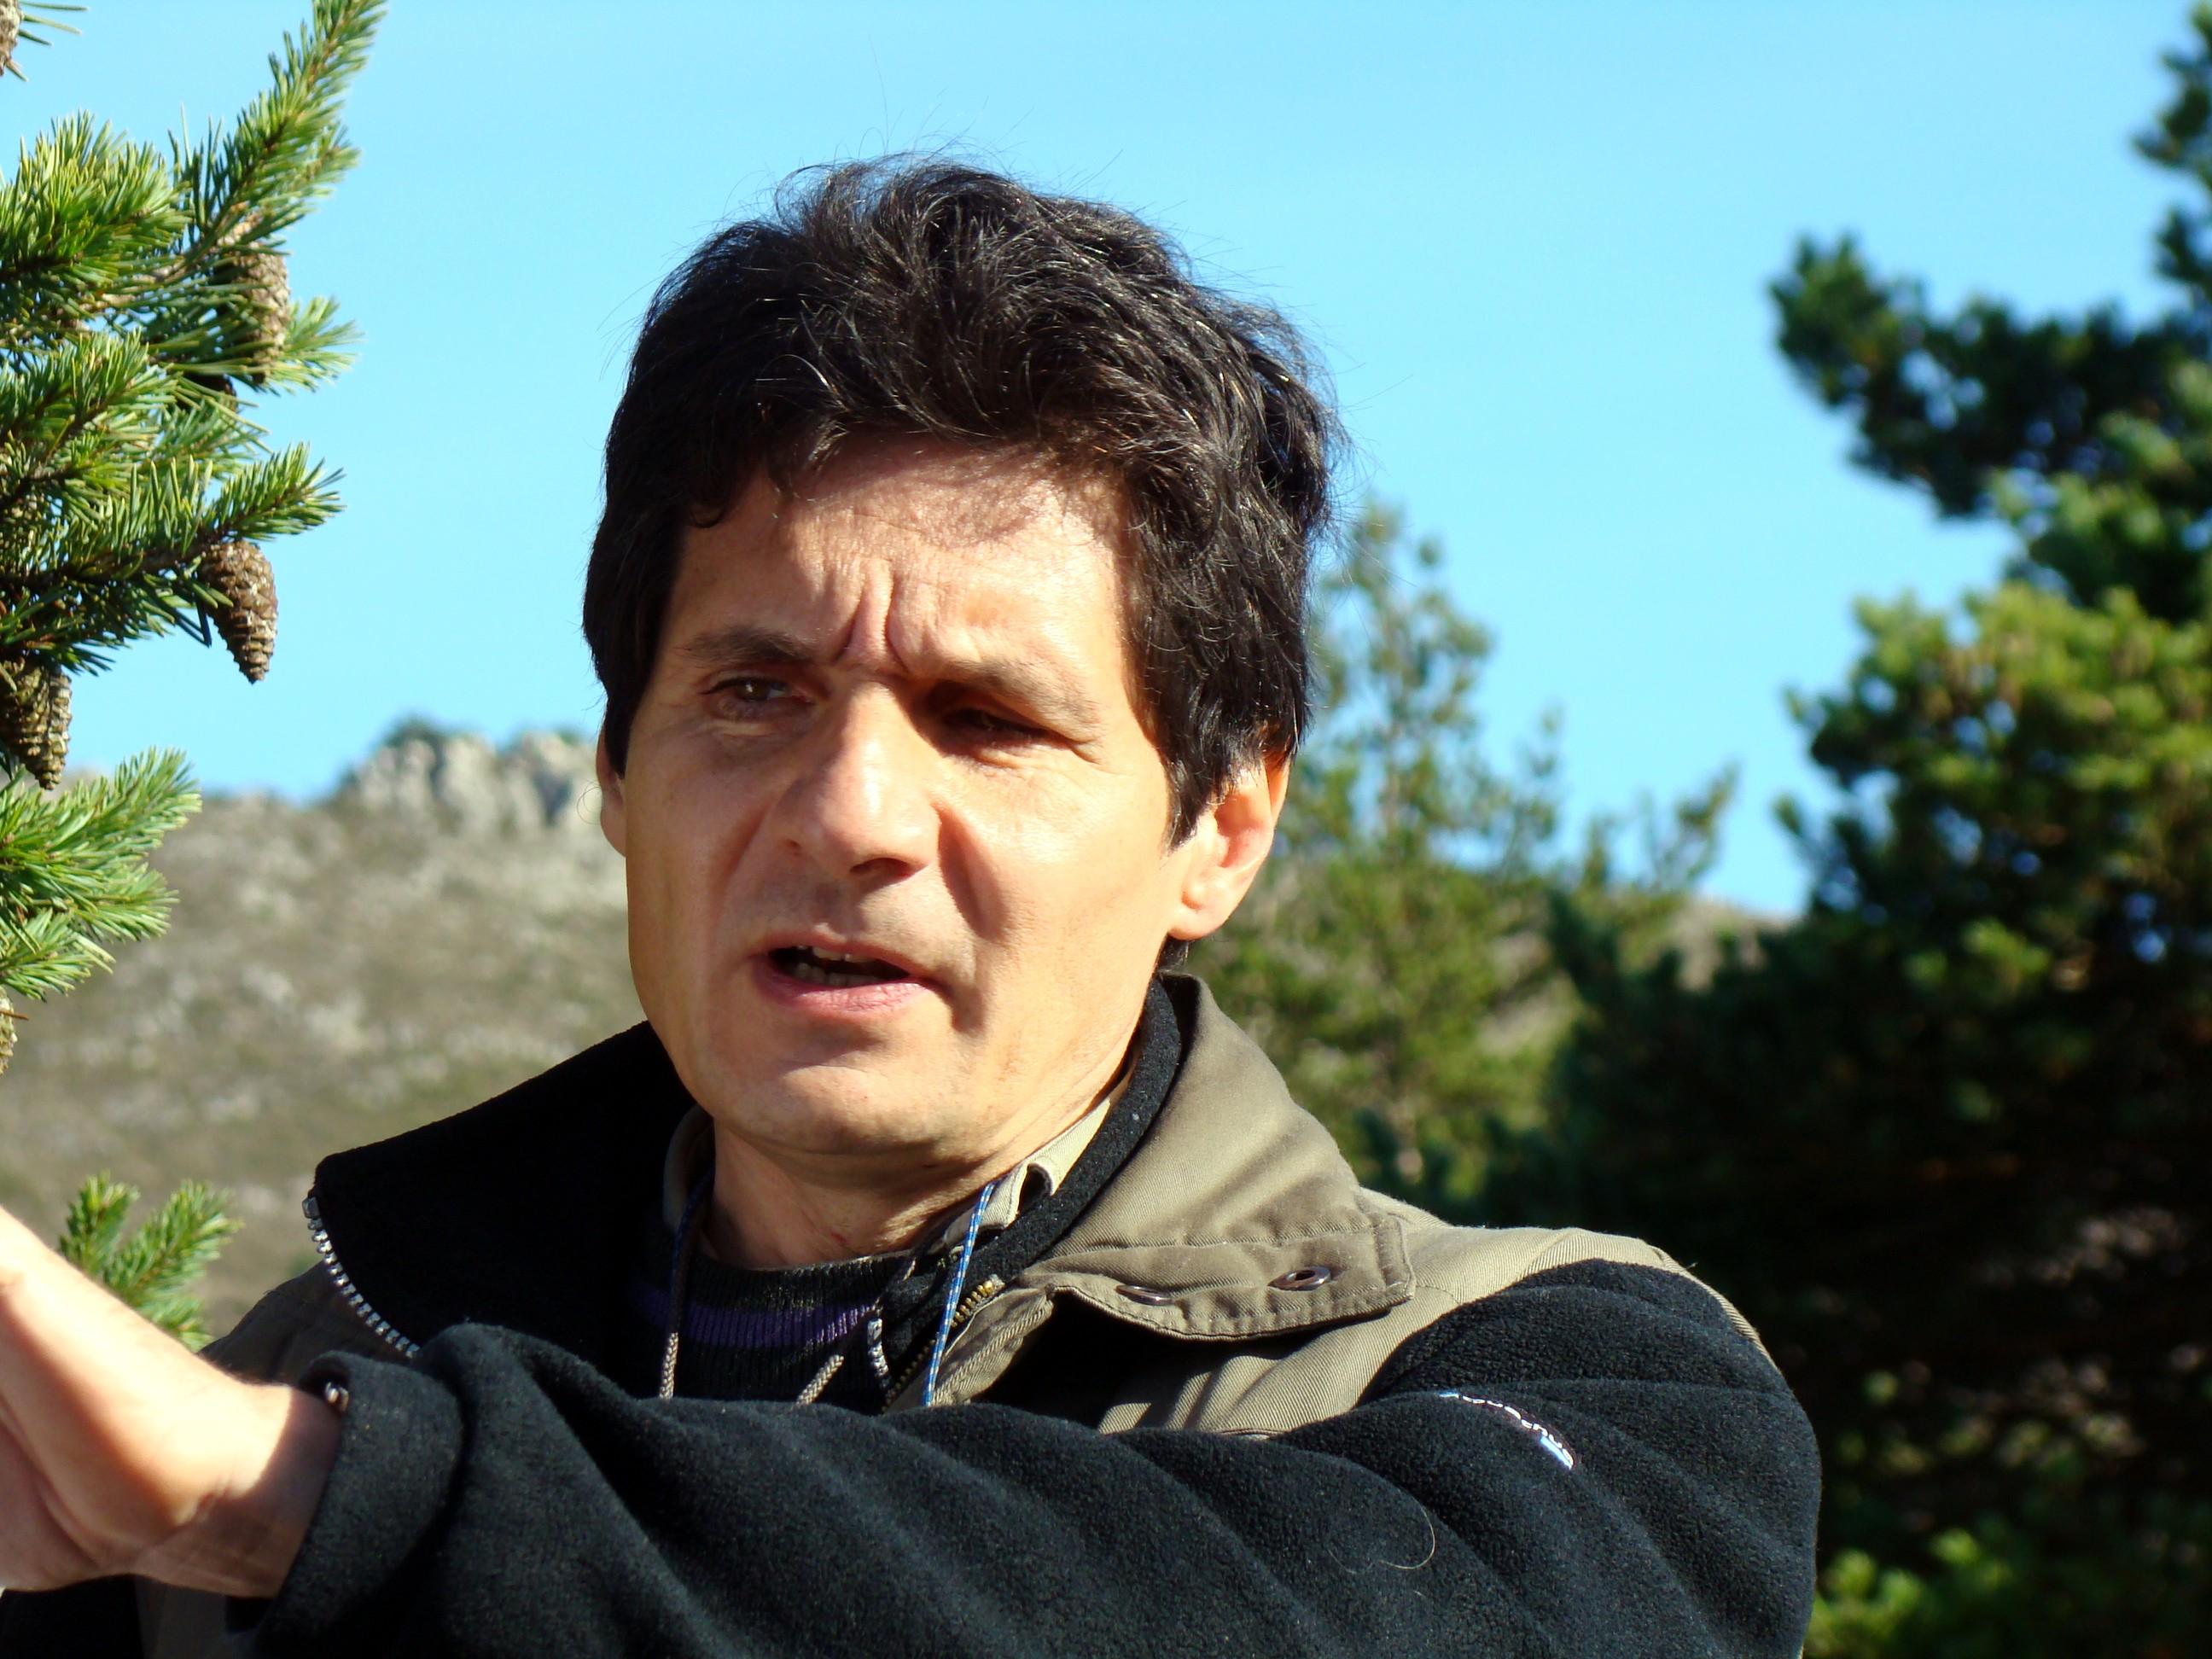 Marc Bottin